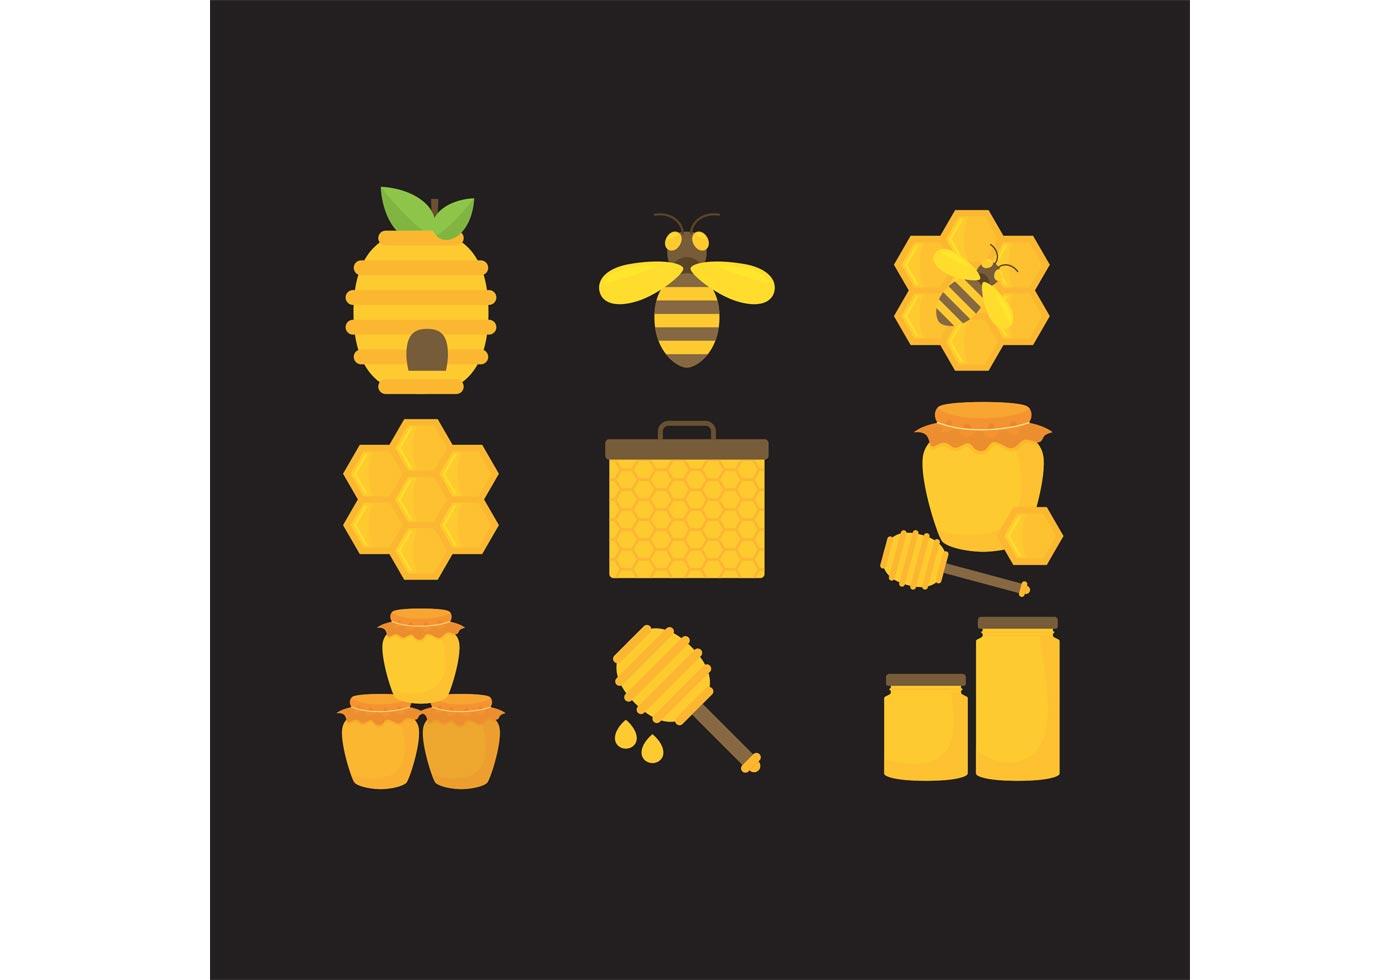 honey vector icons download free vector art stock